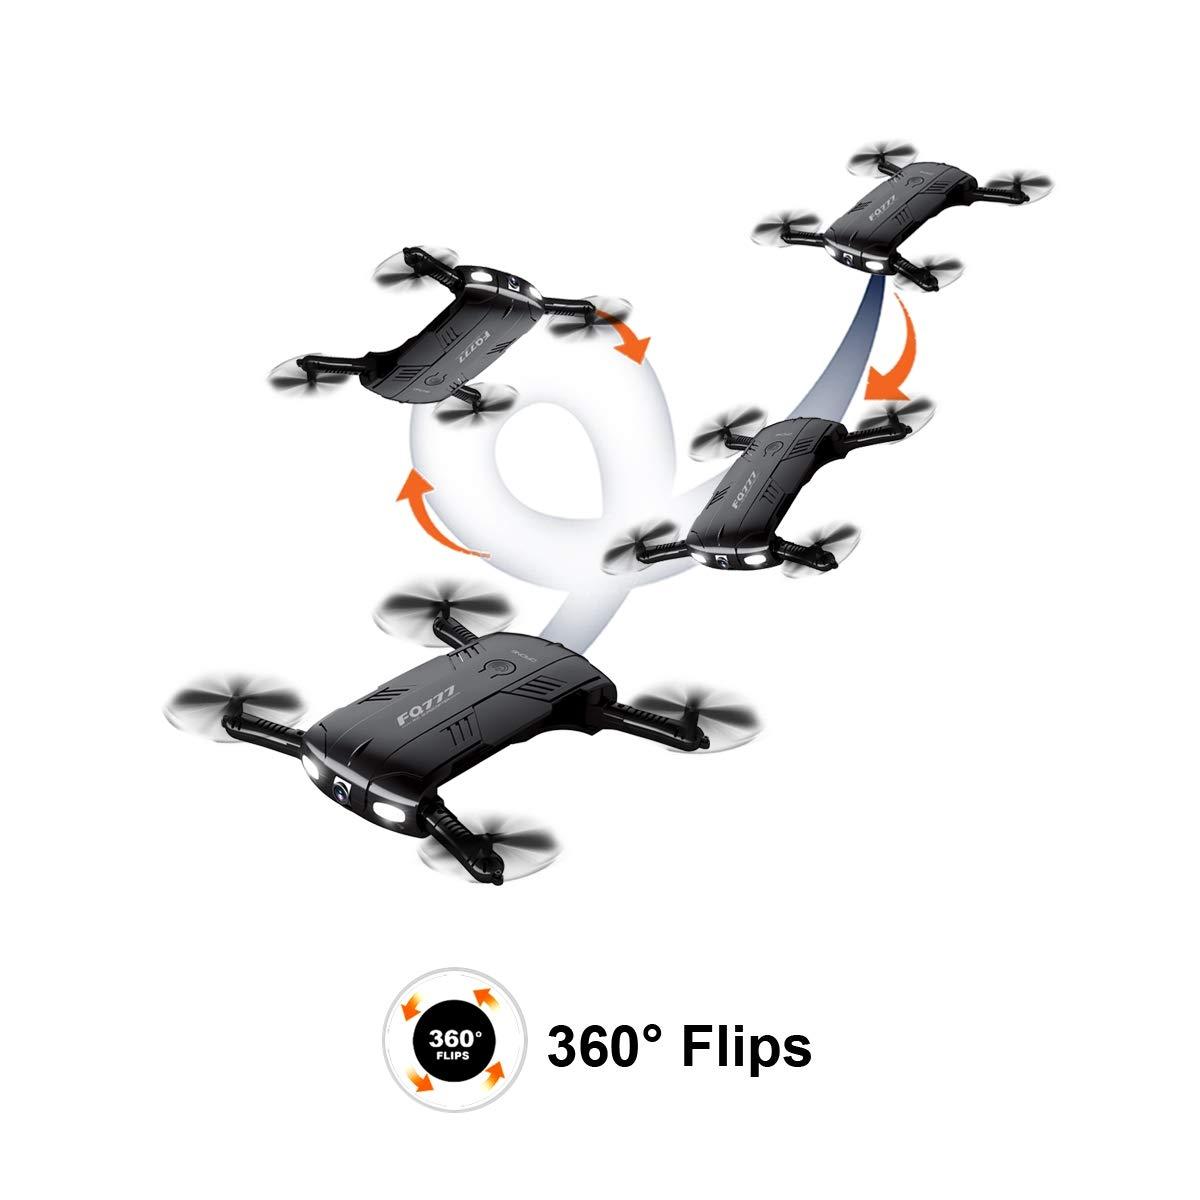 COL PETTI 2.4G 4CH RC RC RC Drohne mit HD Kamera WiFi FPV RC Faltbarer Selfie Drohne RTF RC Drone Quadrocopter Mini Drone 94b510